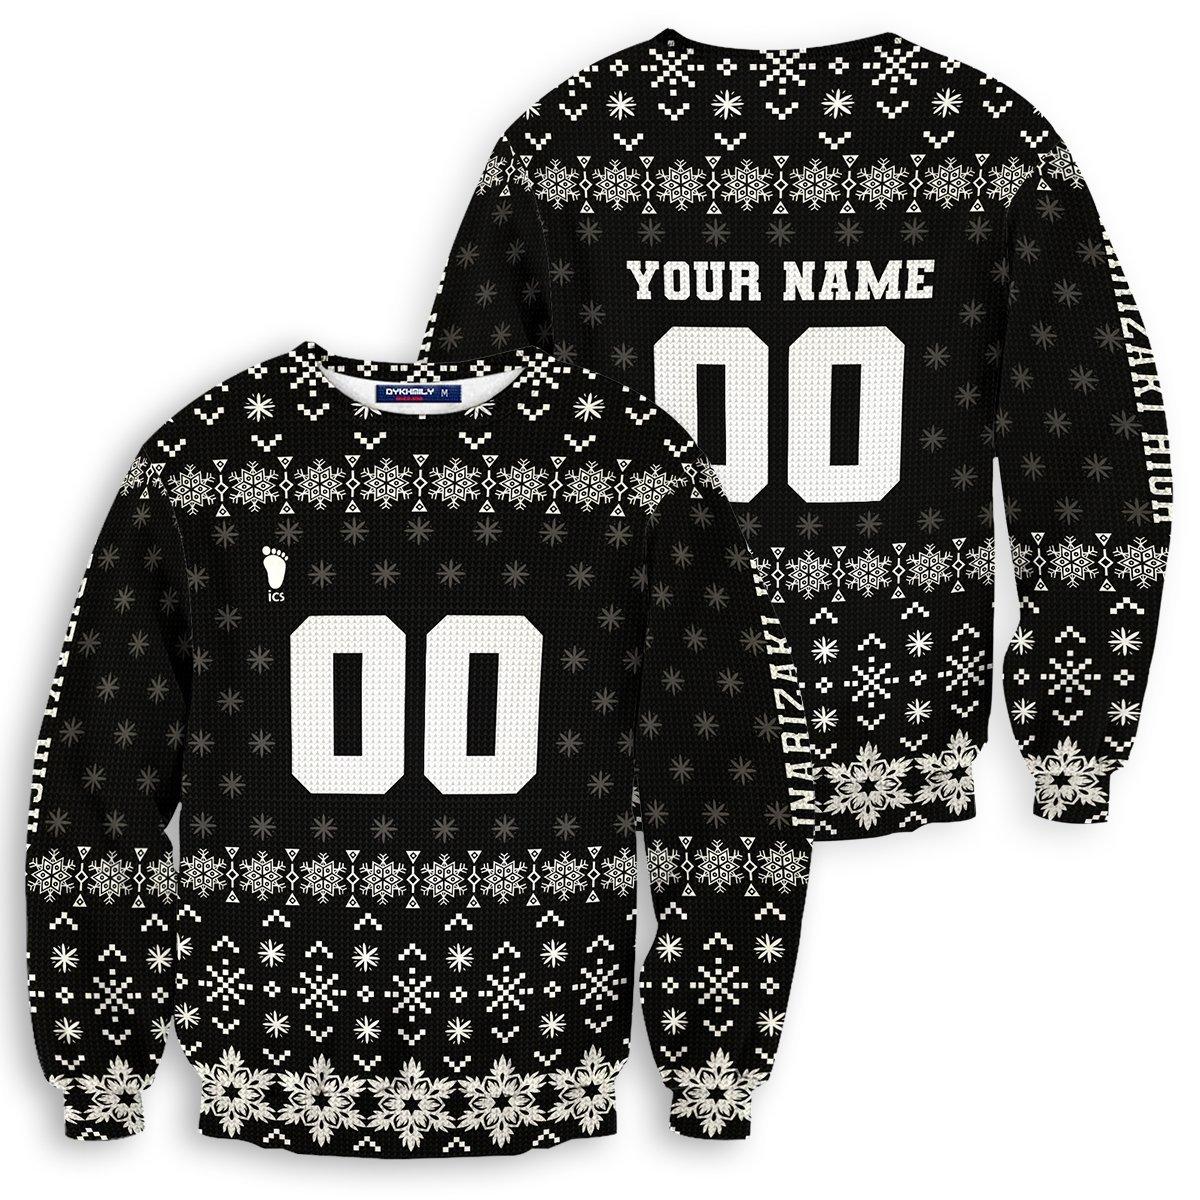 Personalized Team Inarizaki Christmas Unisex Wool Sweater FDM0310 S Official Otaku Treat Merch